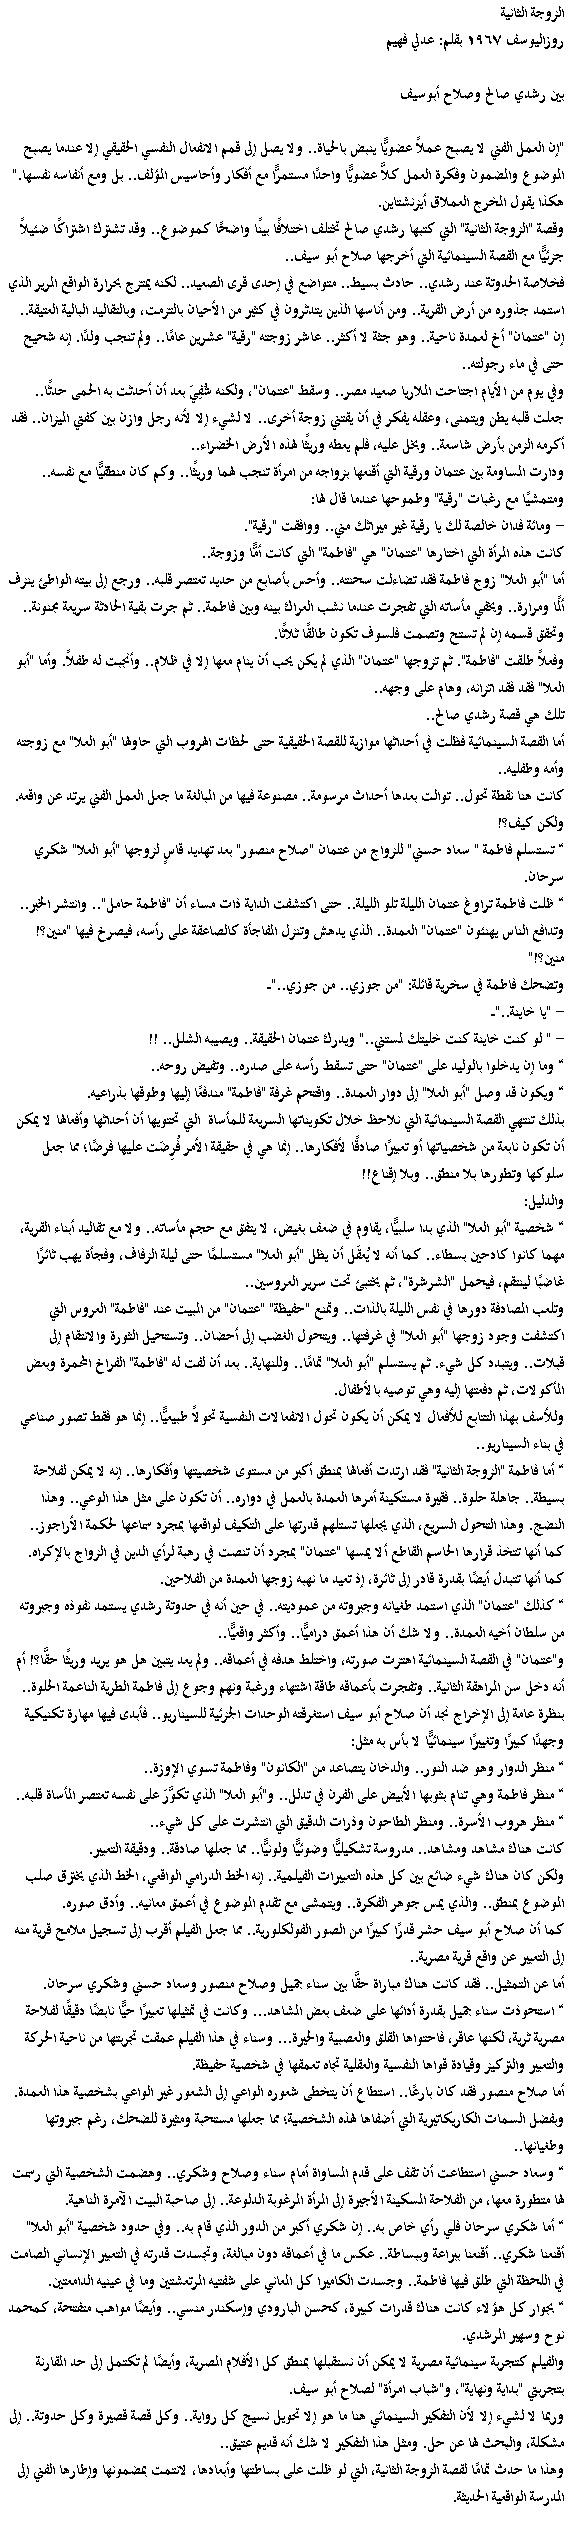 نقد صحفي : بين رشدي صالح وصلاح أبوسيف 1967 م Ooa_co10